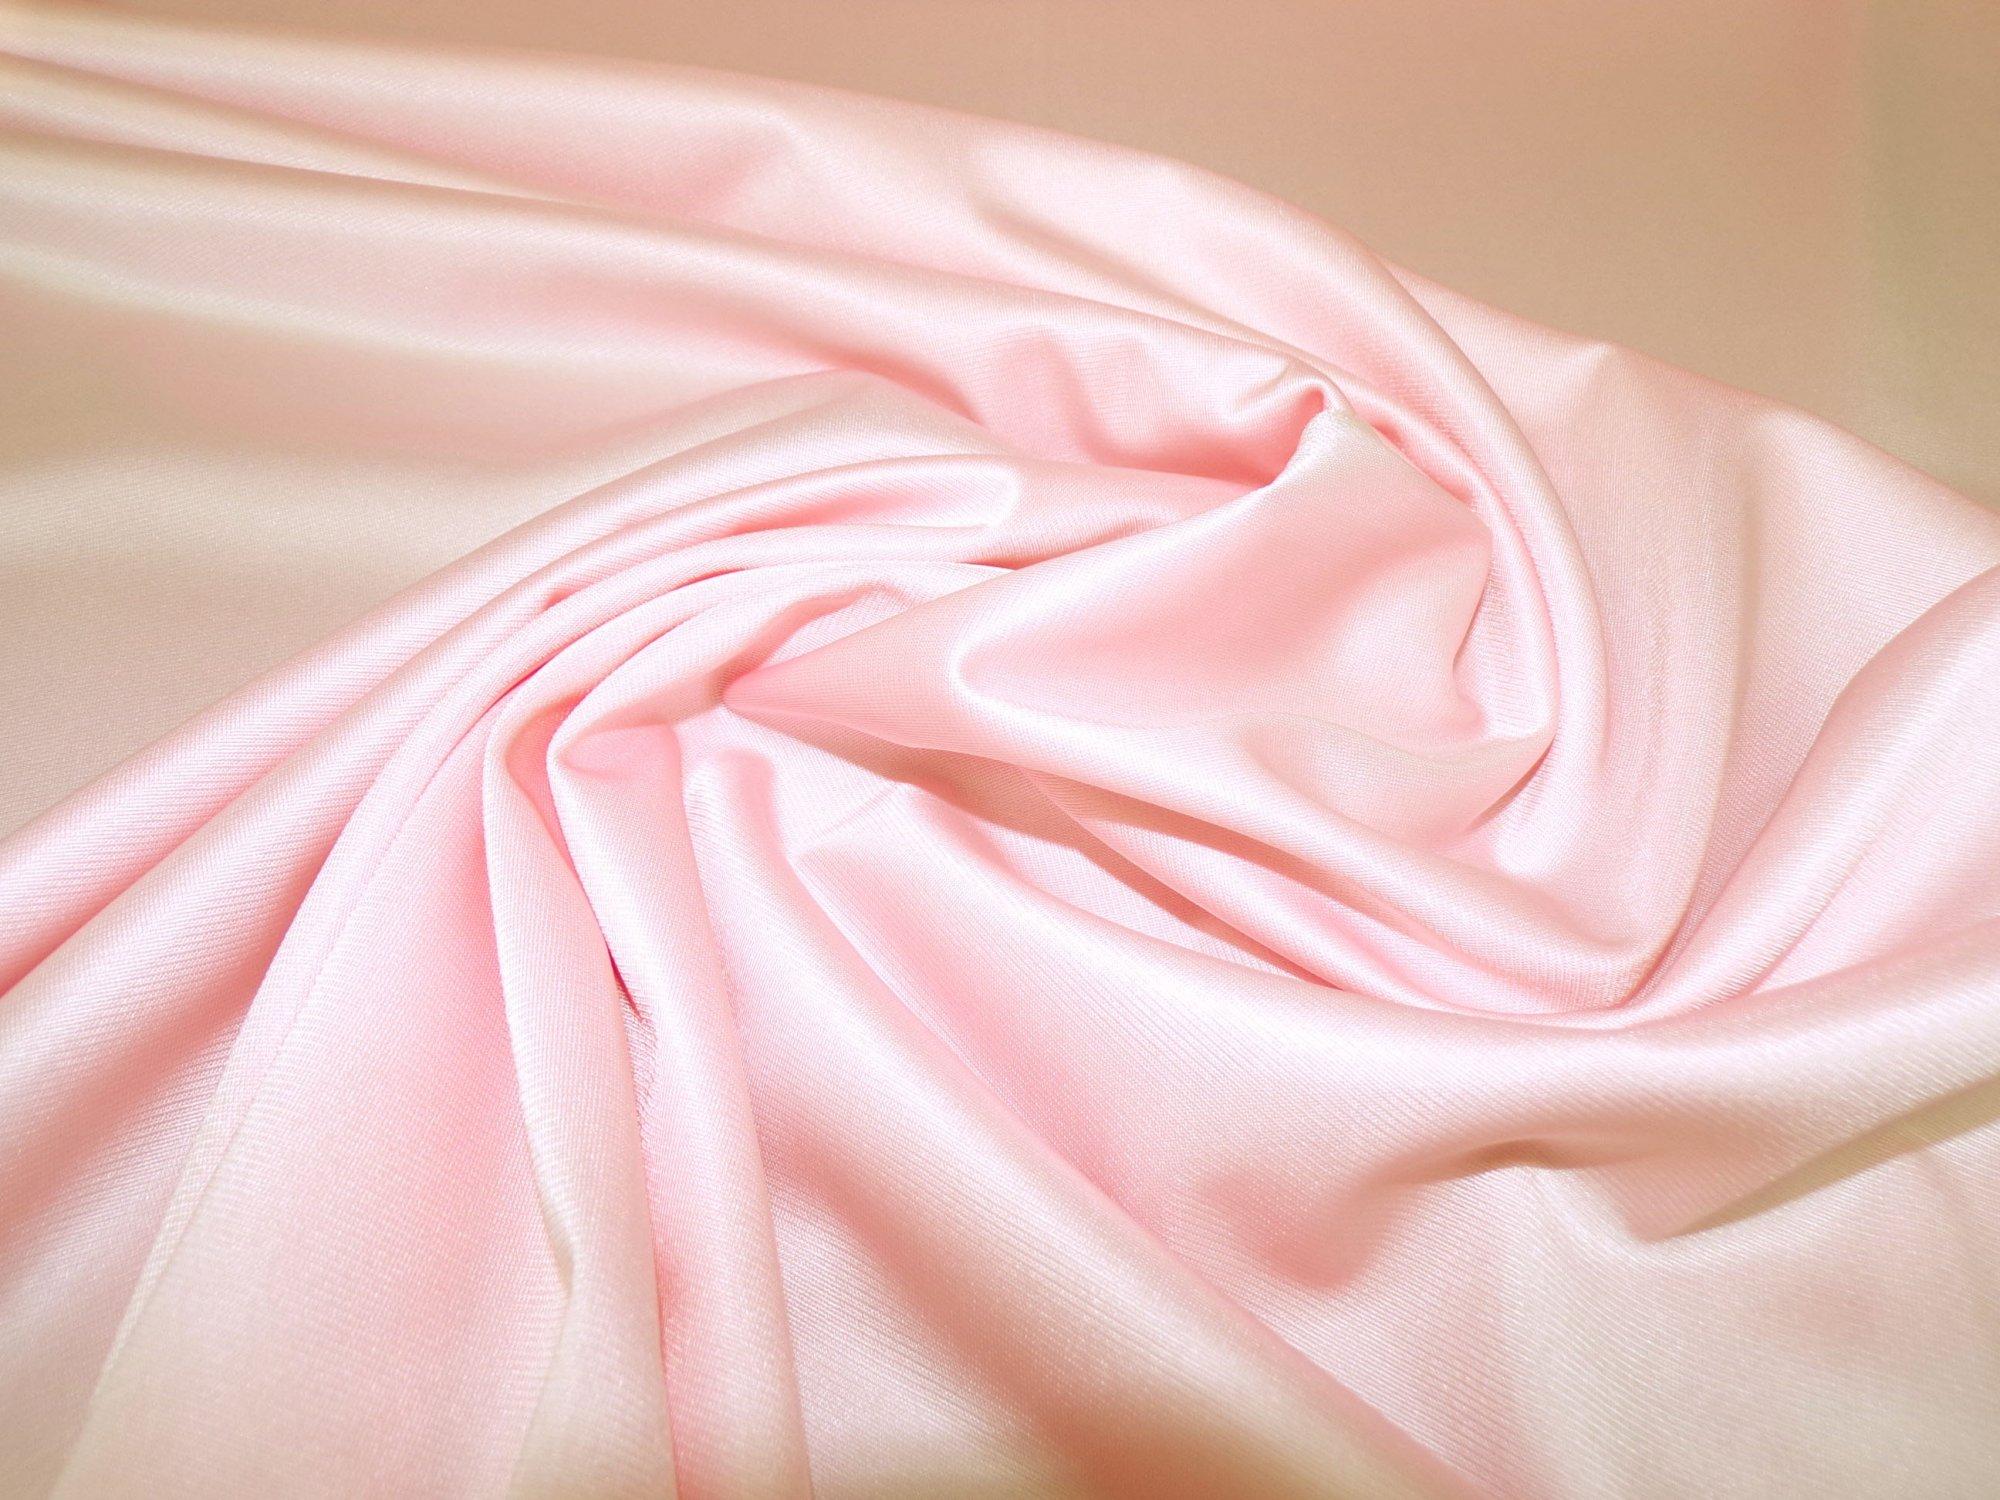 40 Denier Nylon Tricot - Peachy Pink